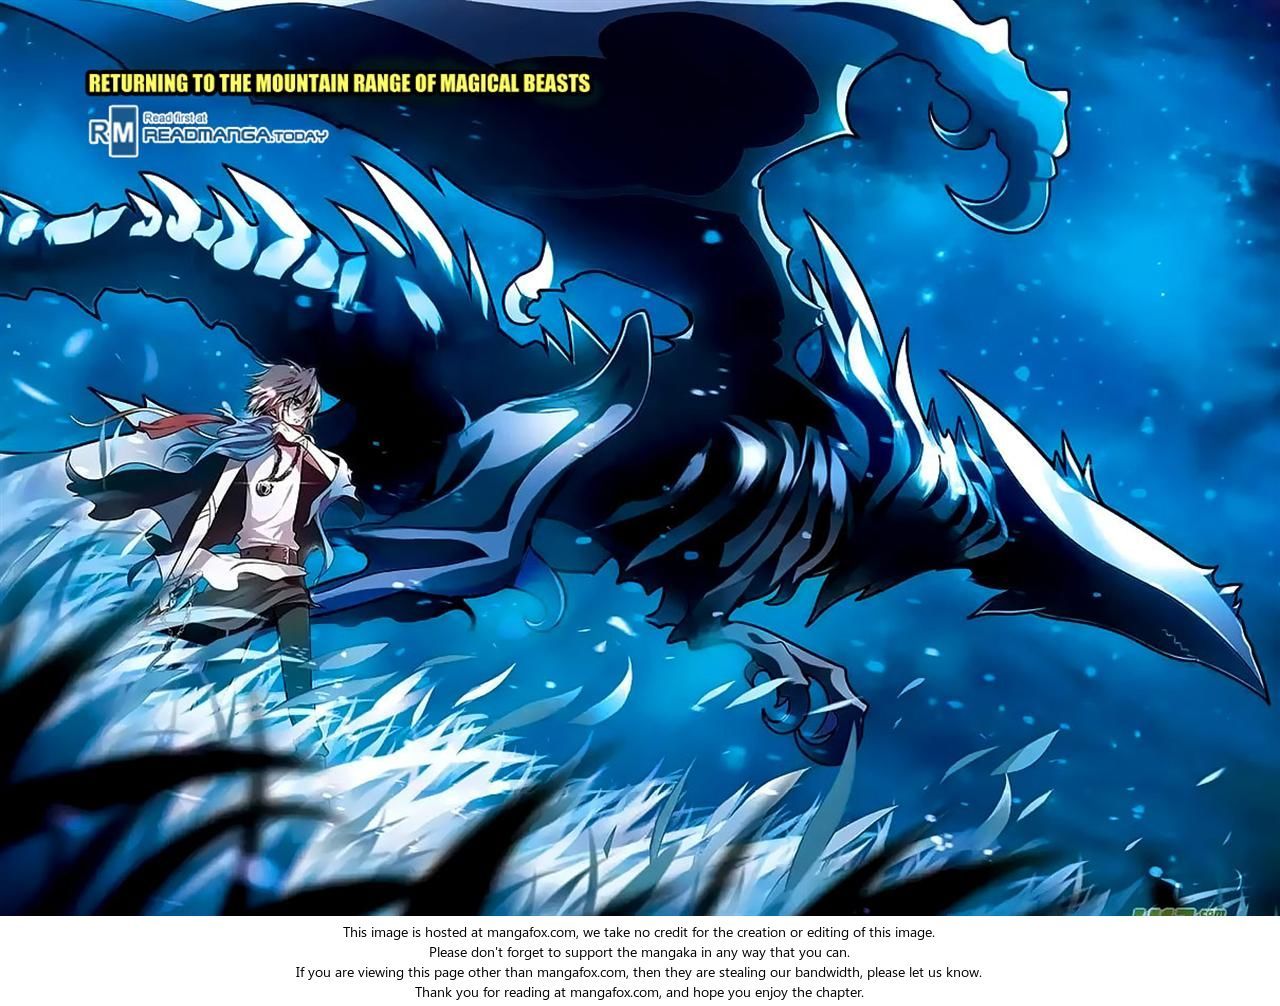 Panlong 49: Returning to the Mountain Range of Magical Beasts at MangaFox